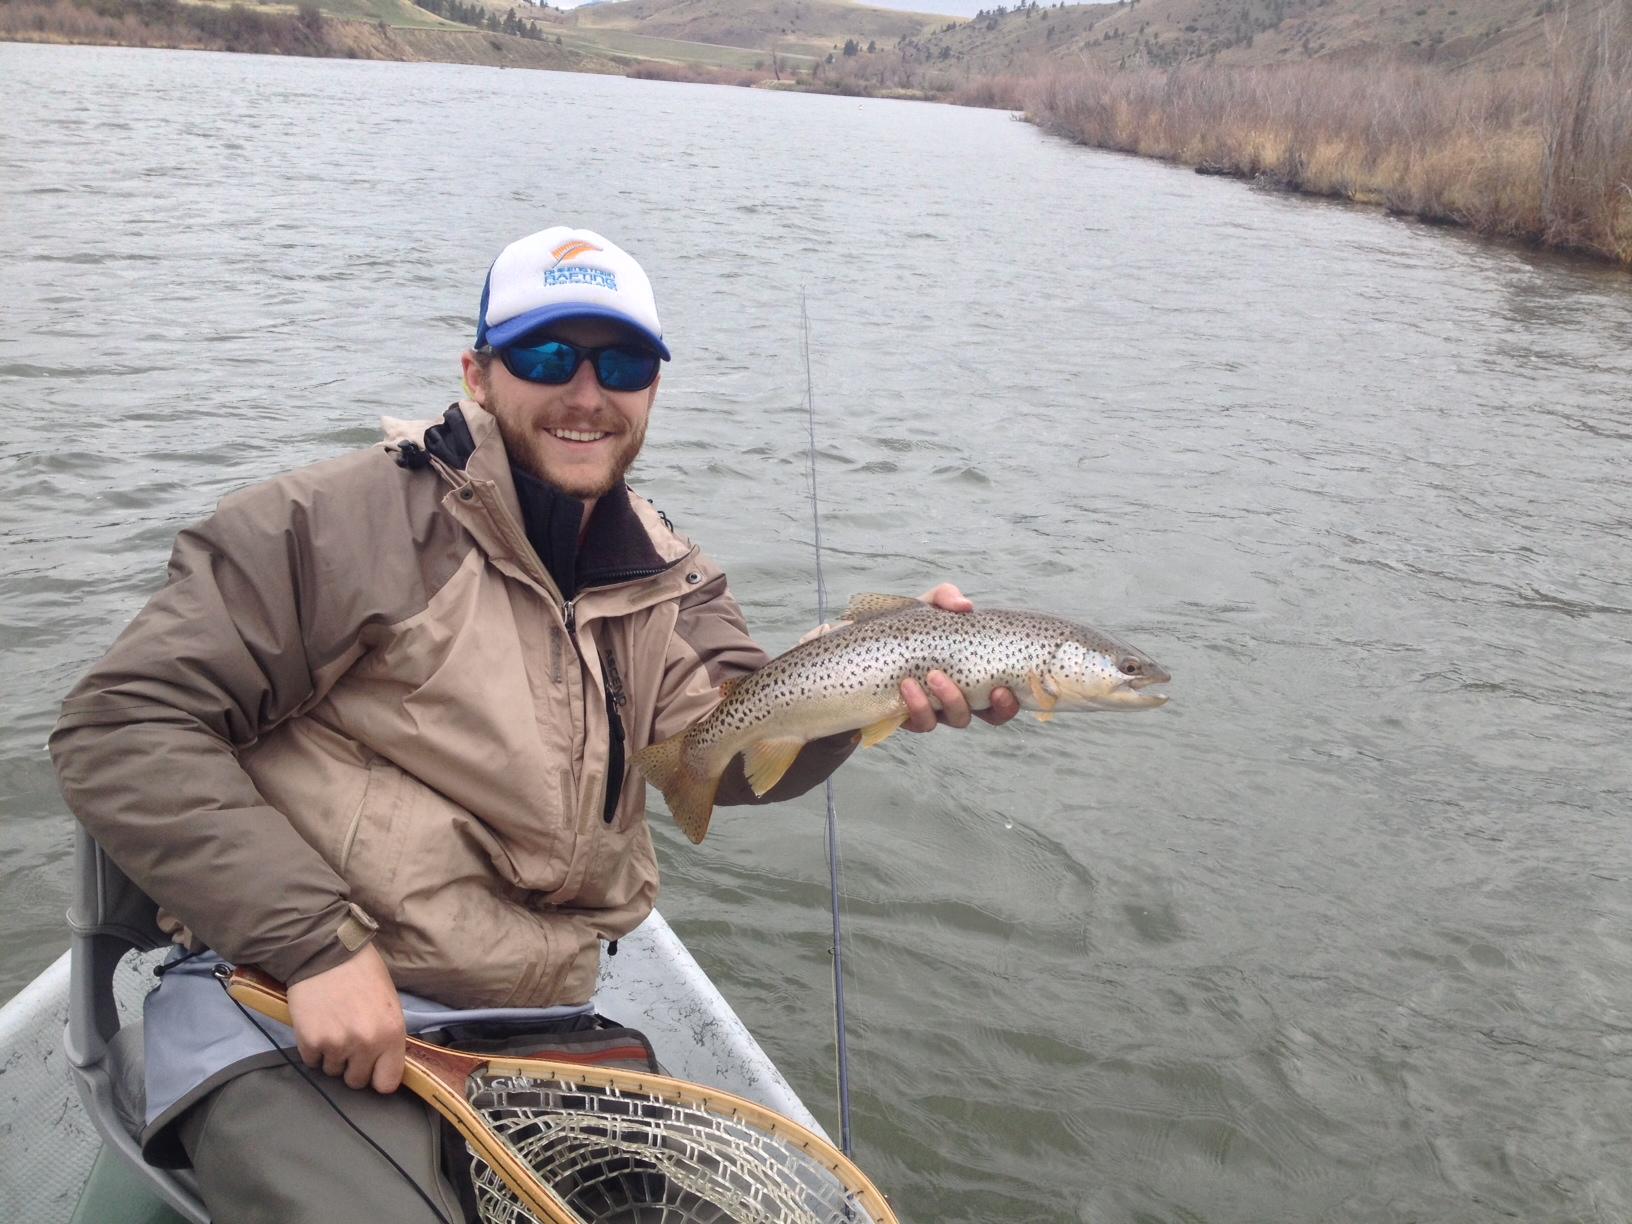 Missouri river fishing report 5 4 14 crosscurrents fly for Missouri river fishing